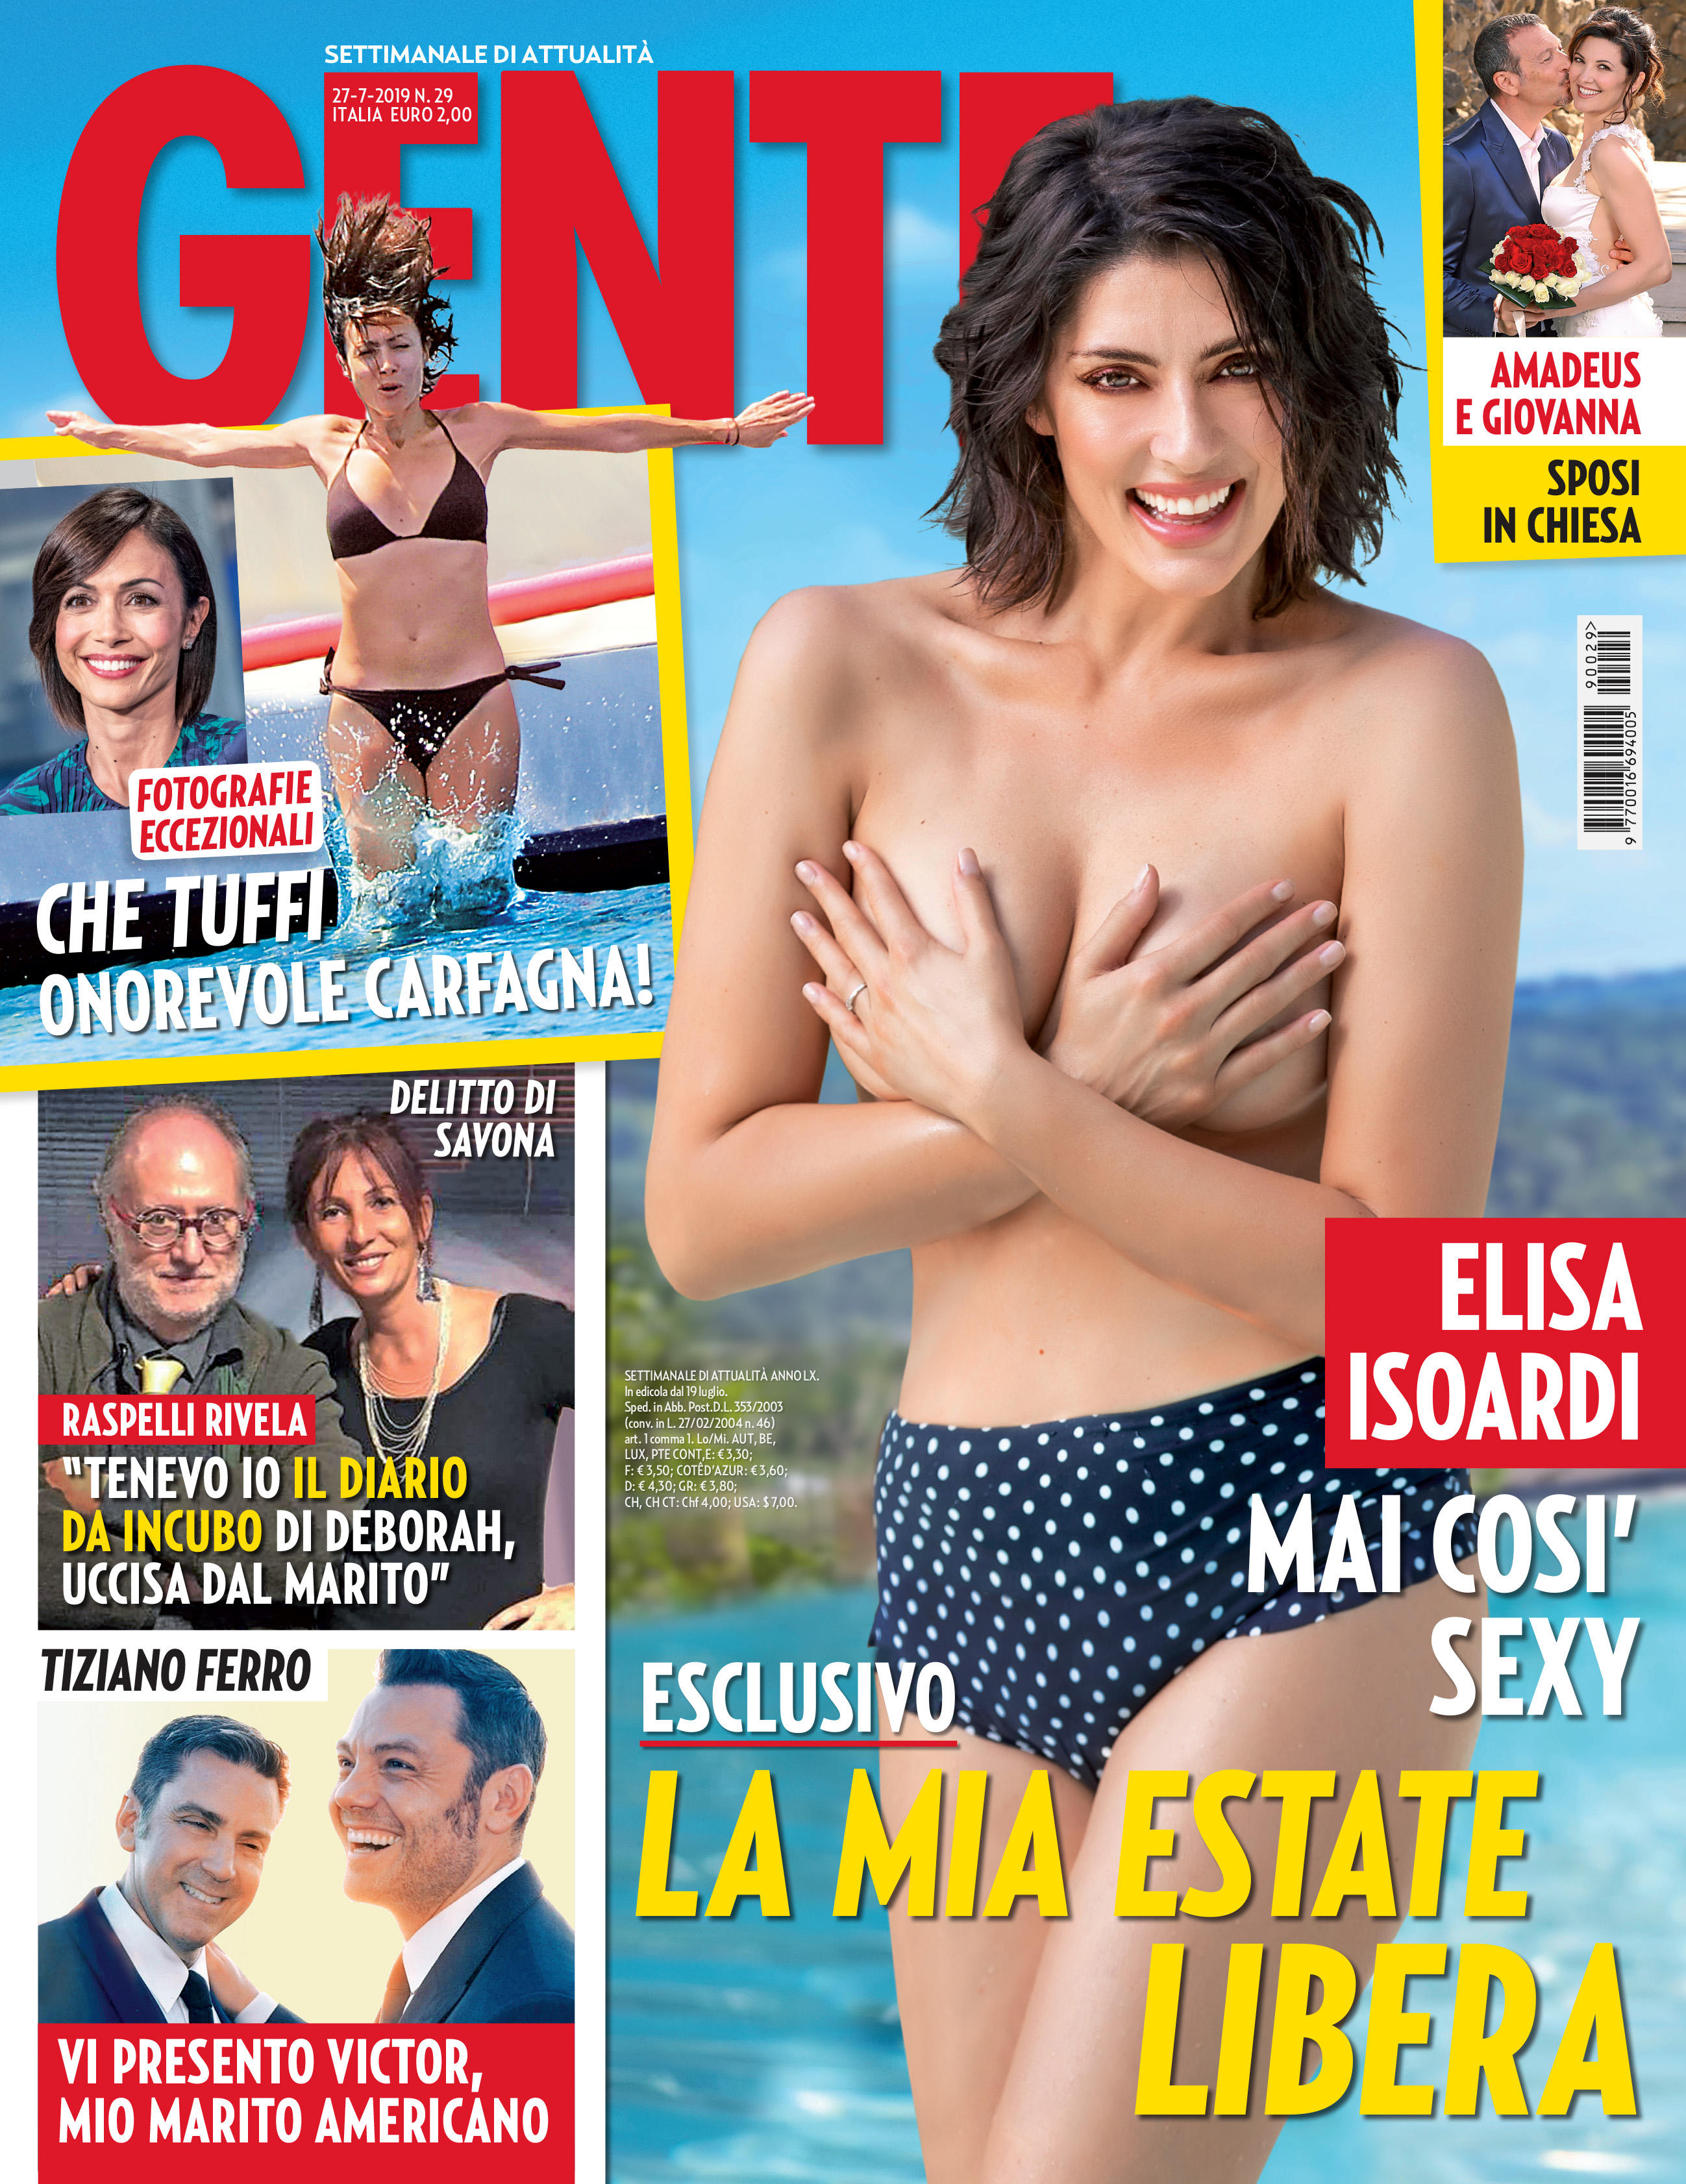 Elisa Isoardi in topless: ecco la mia estate libera